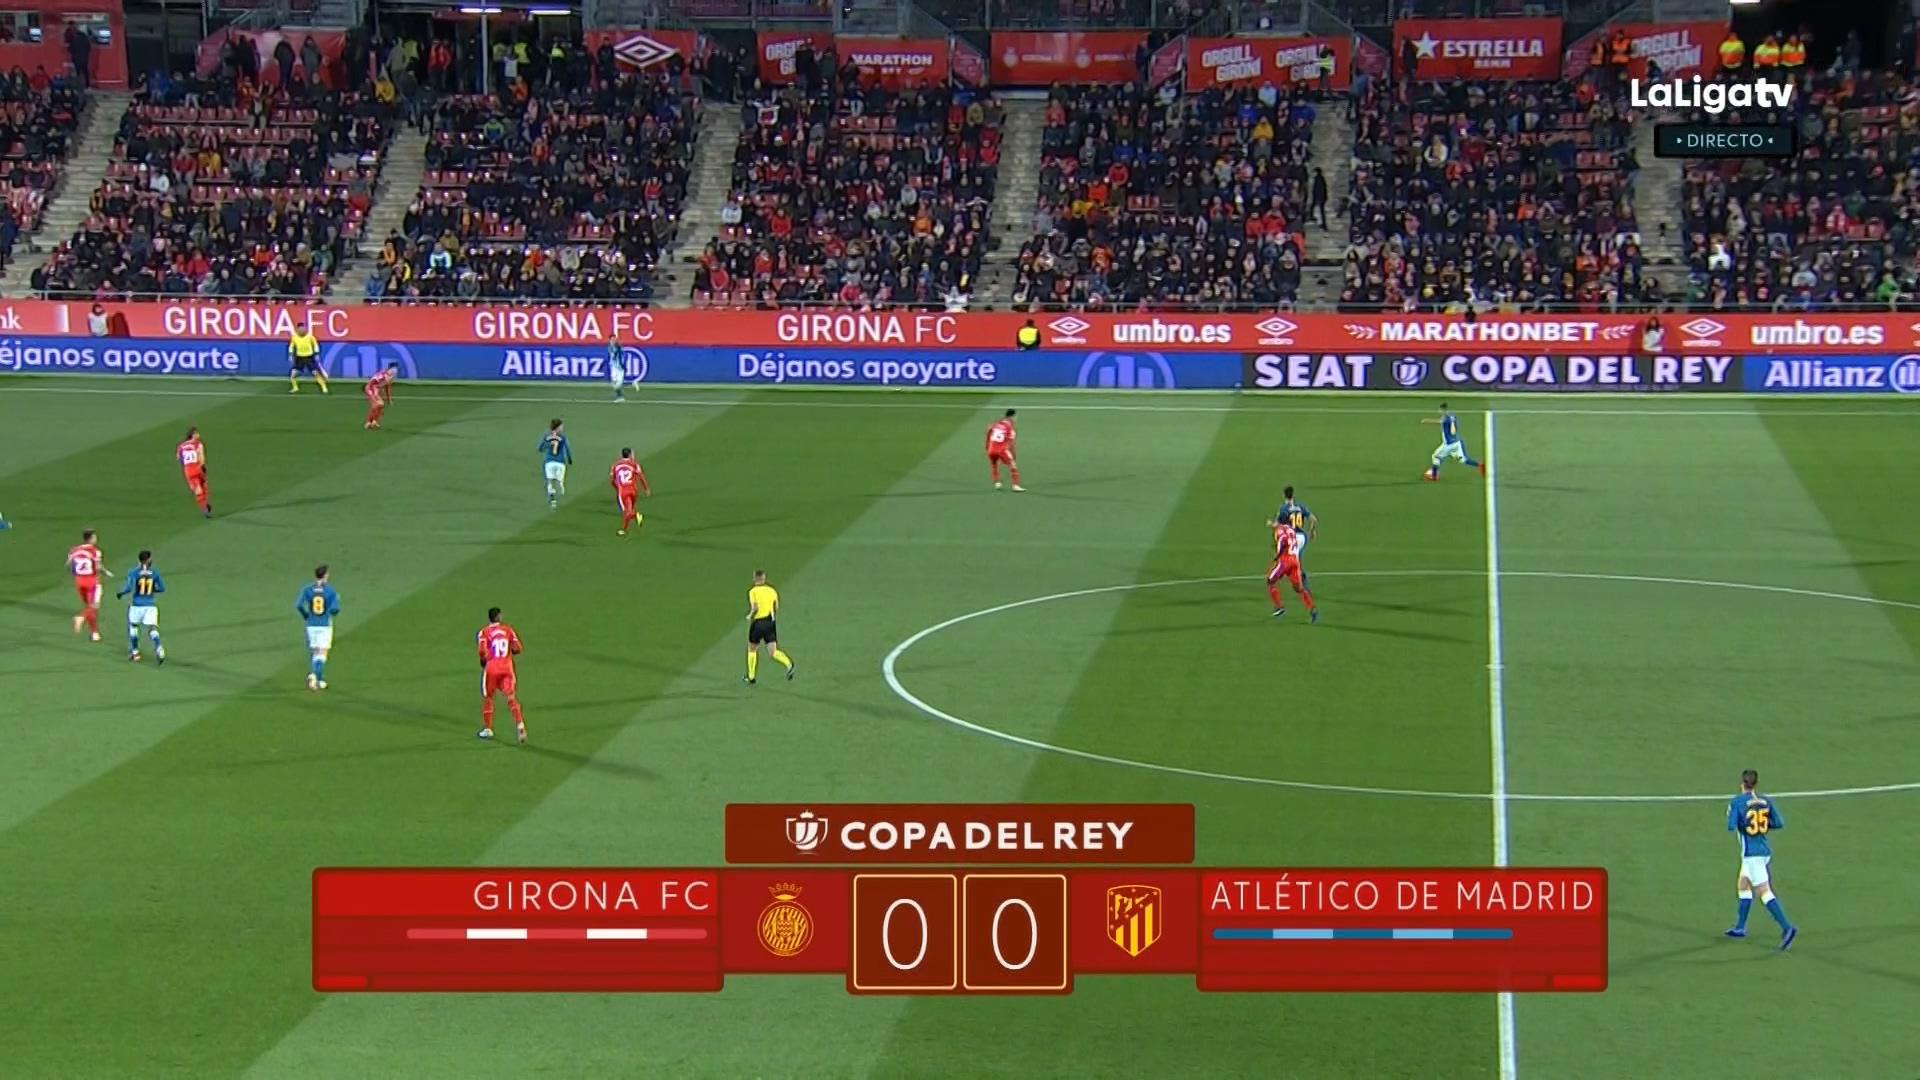 Xem lại: Girona vs Atletico Madrid